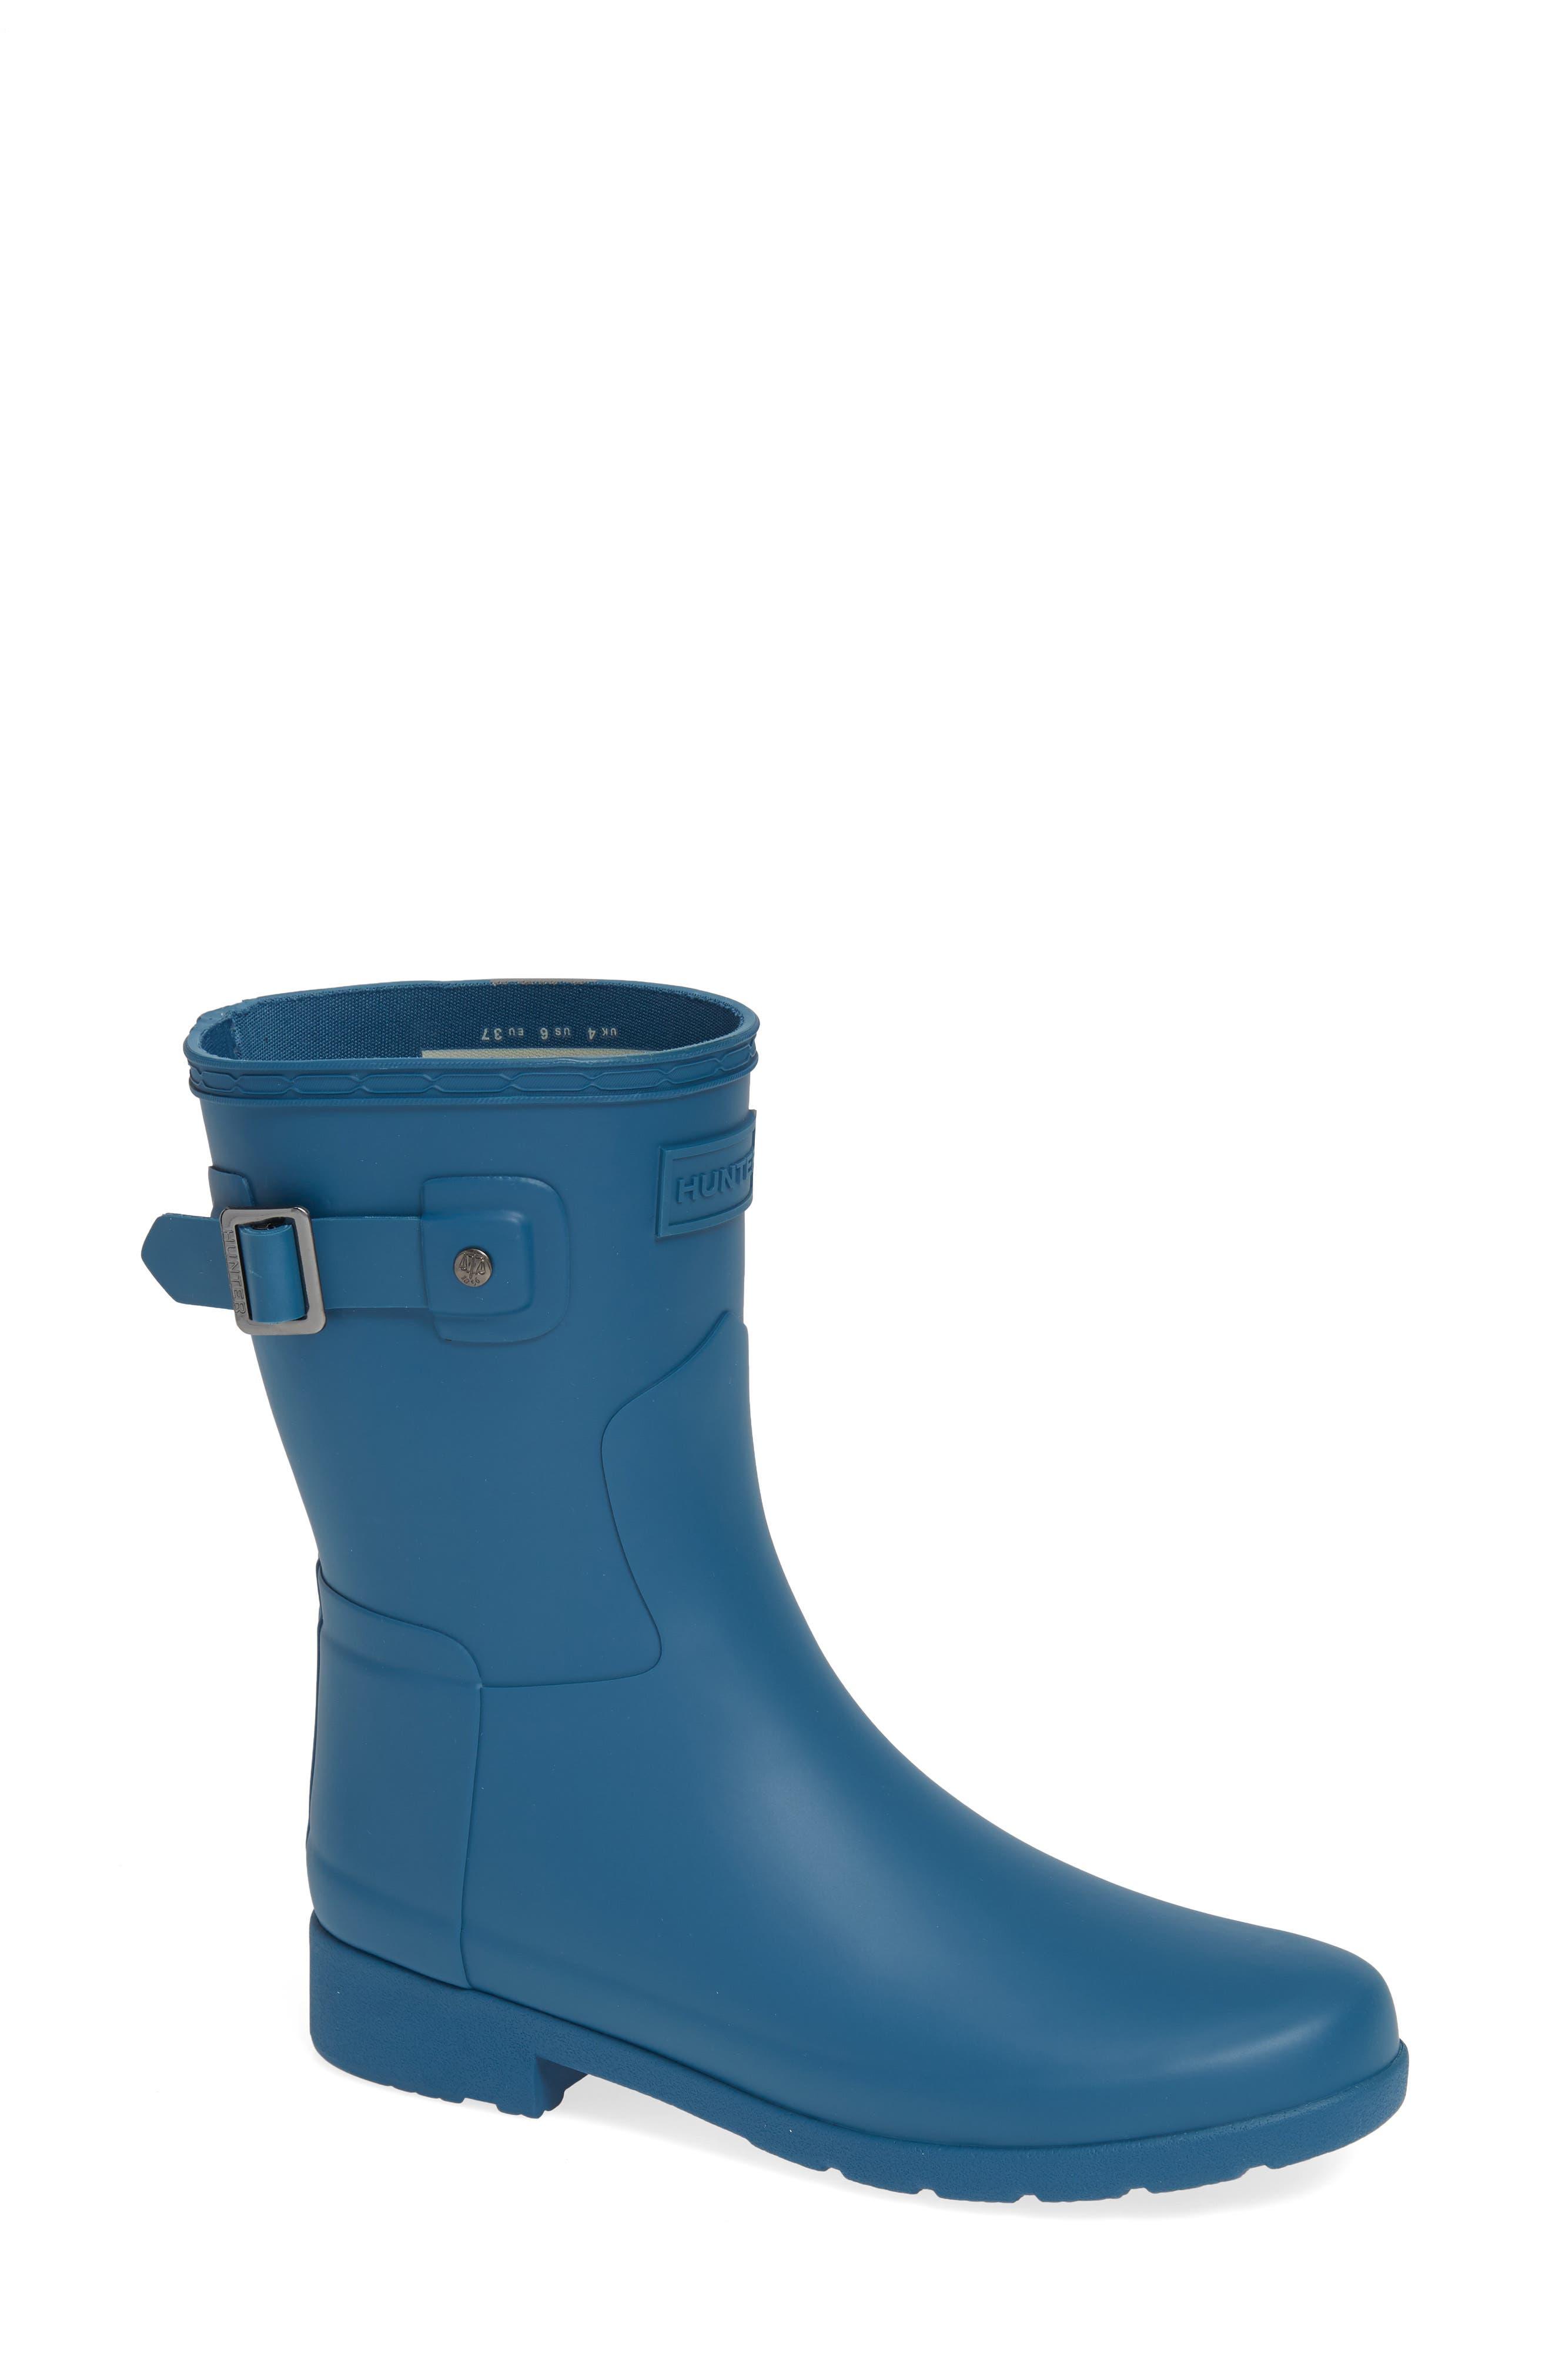 HUNTER Original Refined Short Waterproof Rain Boot, Main, color, 440